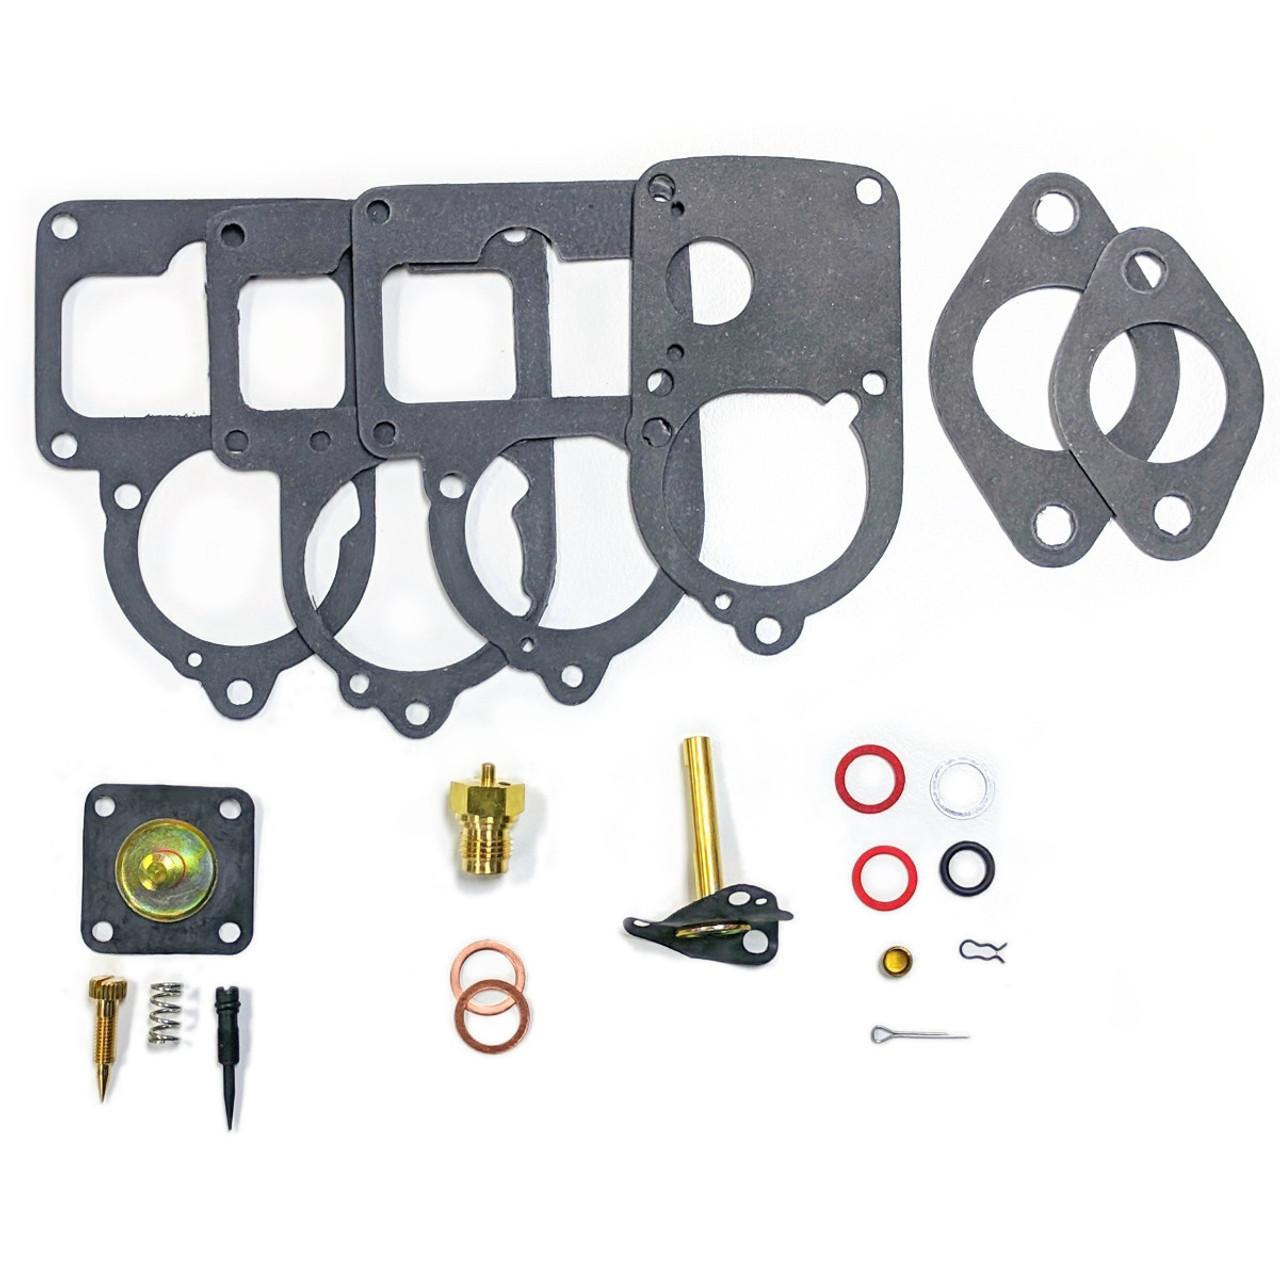 RADKE VW SOLEX CARB REBUILD KIT, VW BUG / BEETLE 28 PICT-34-3 113-198-575U,  21 pc  KIT